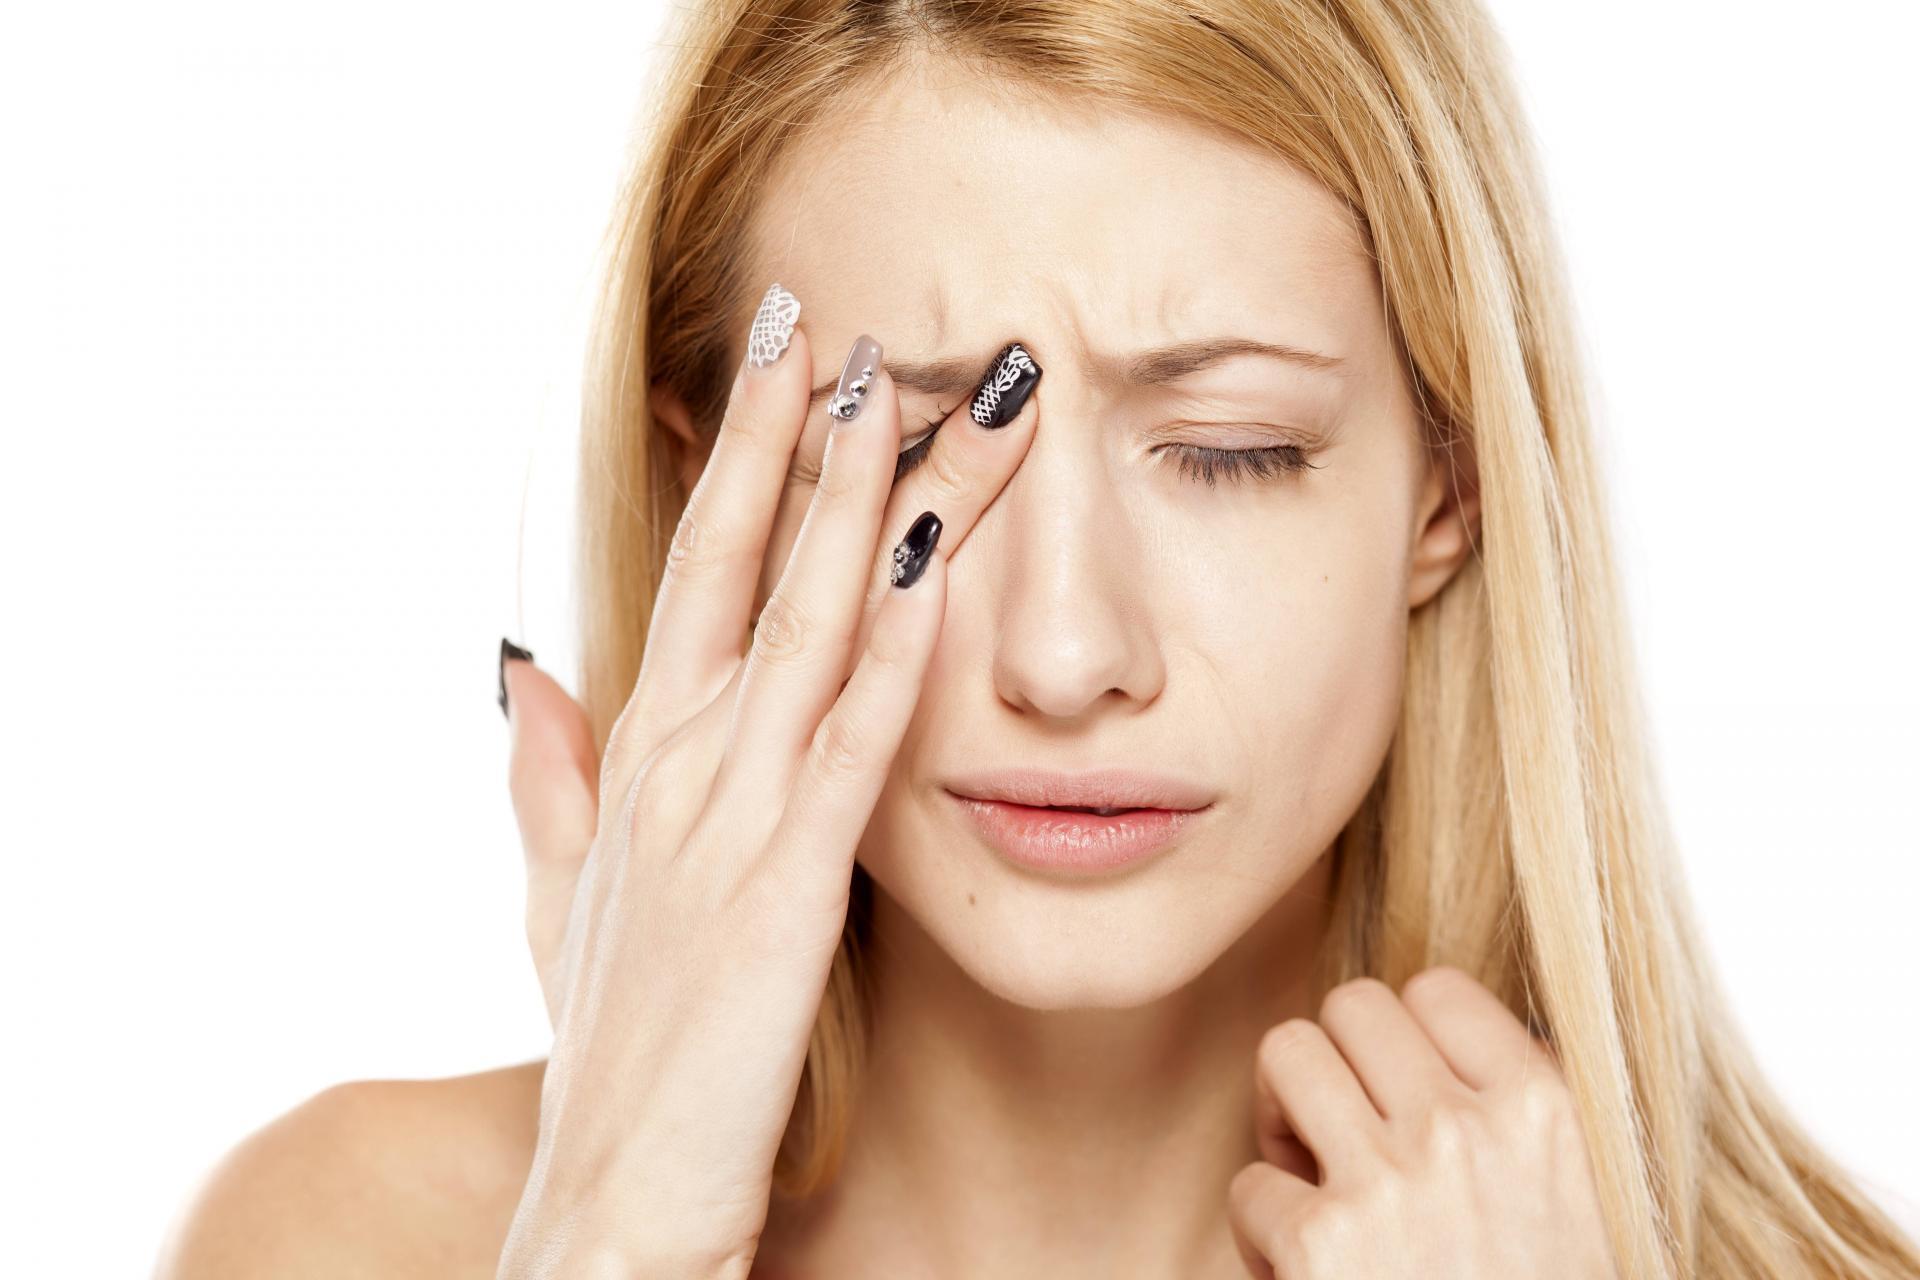 Inflamed facial nerve headache eyebrow — photo 8